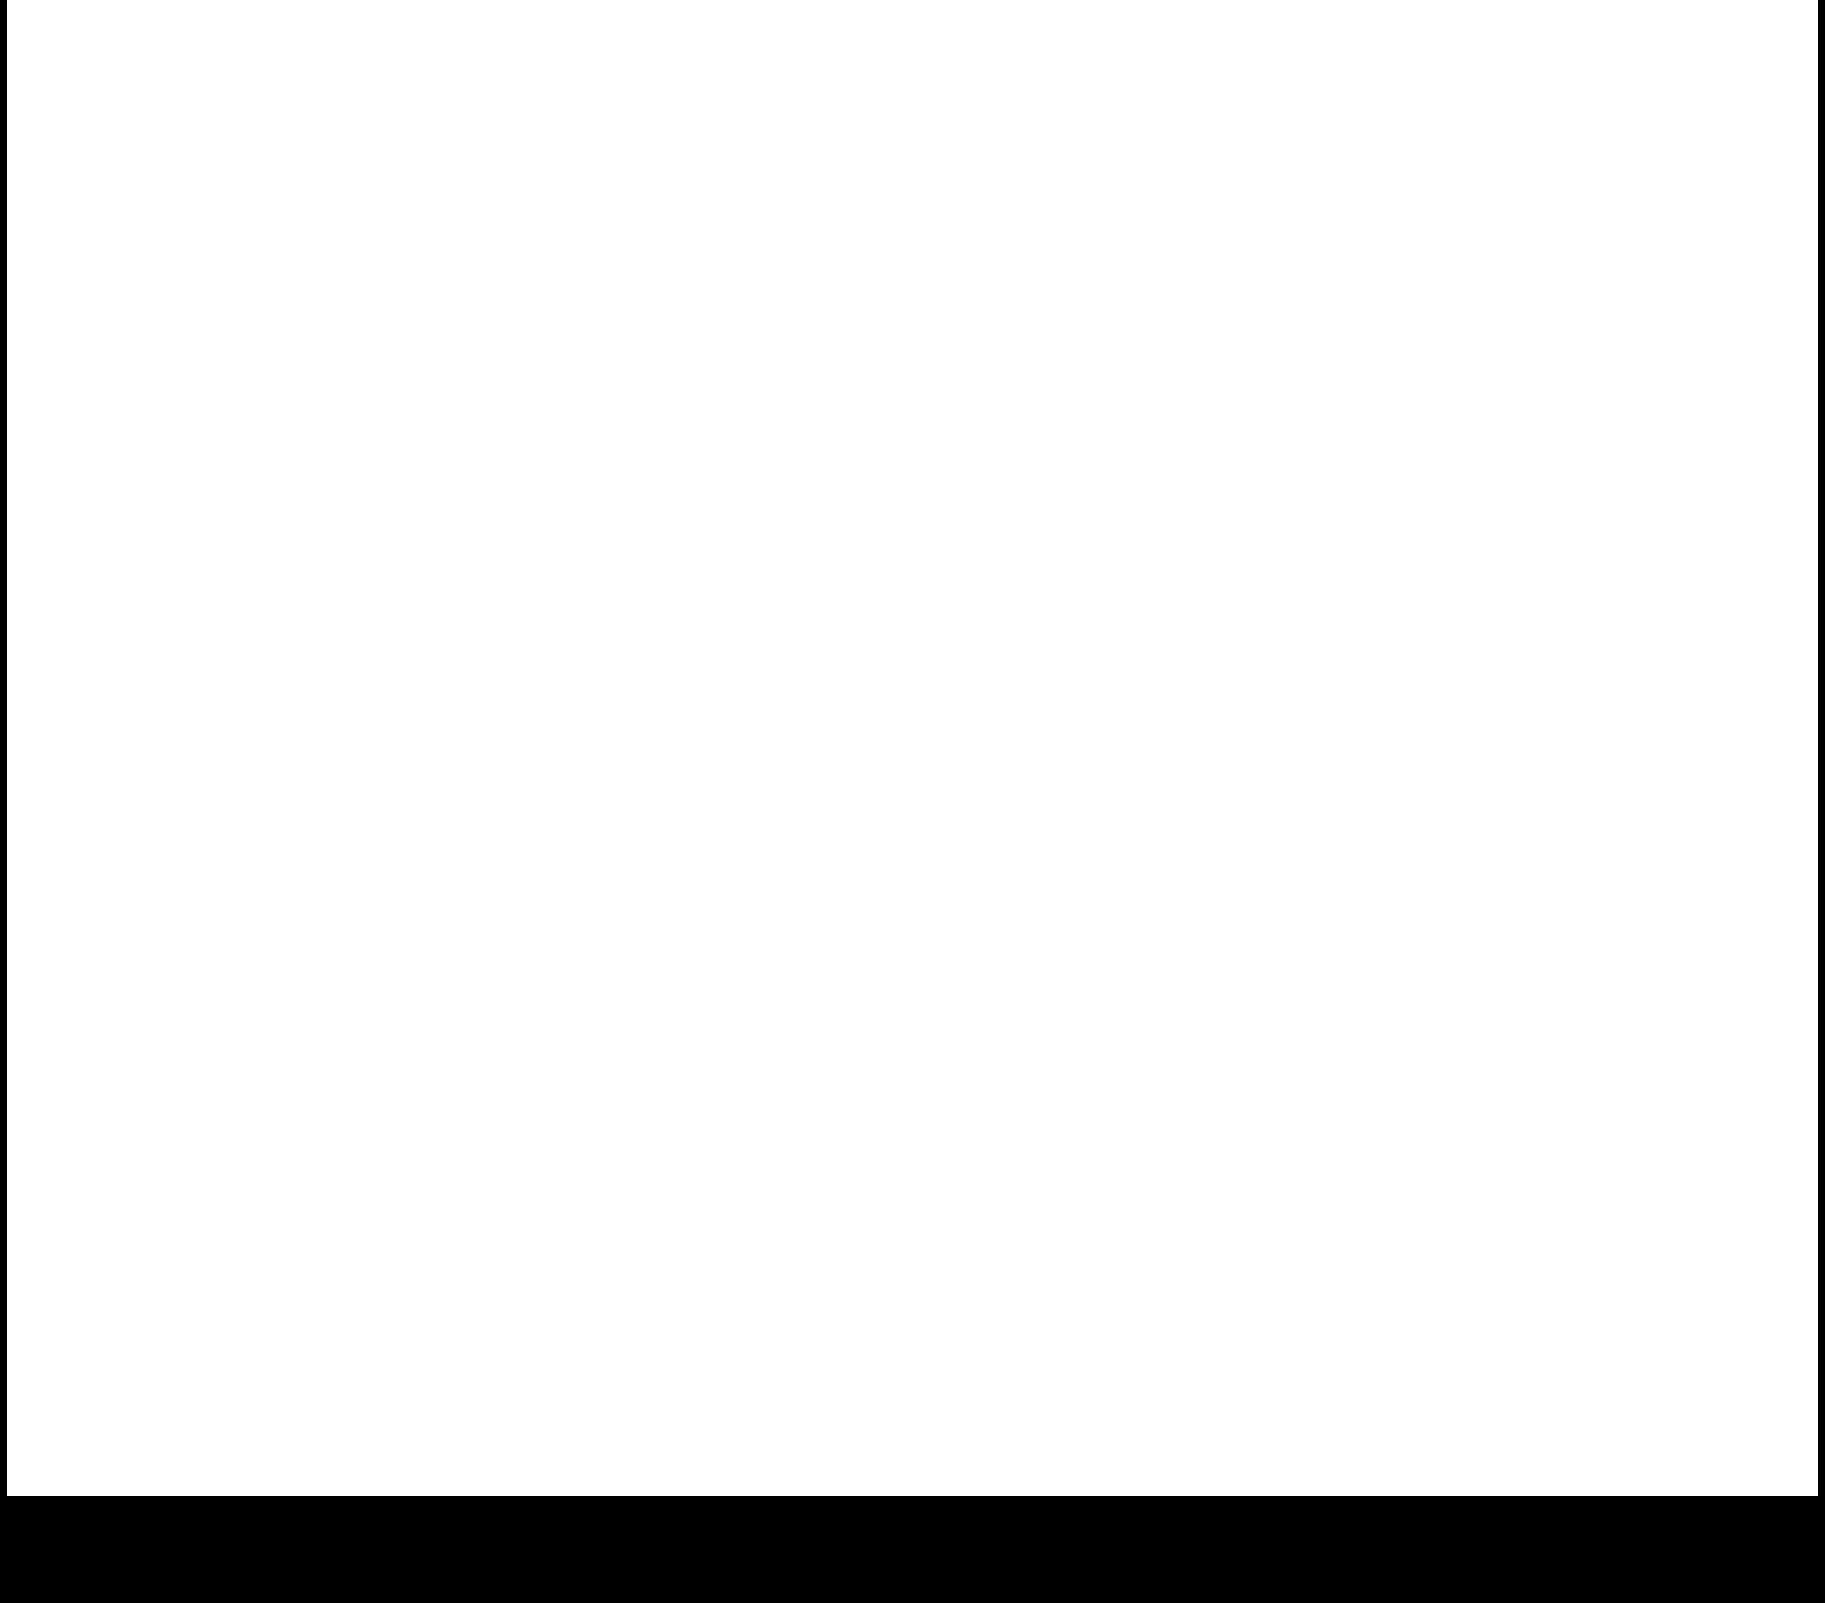 Southern Range Brewing